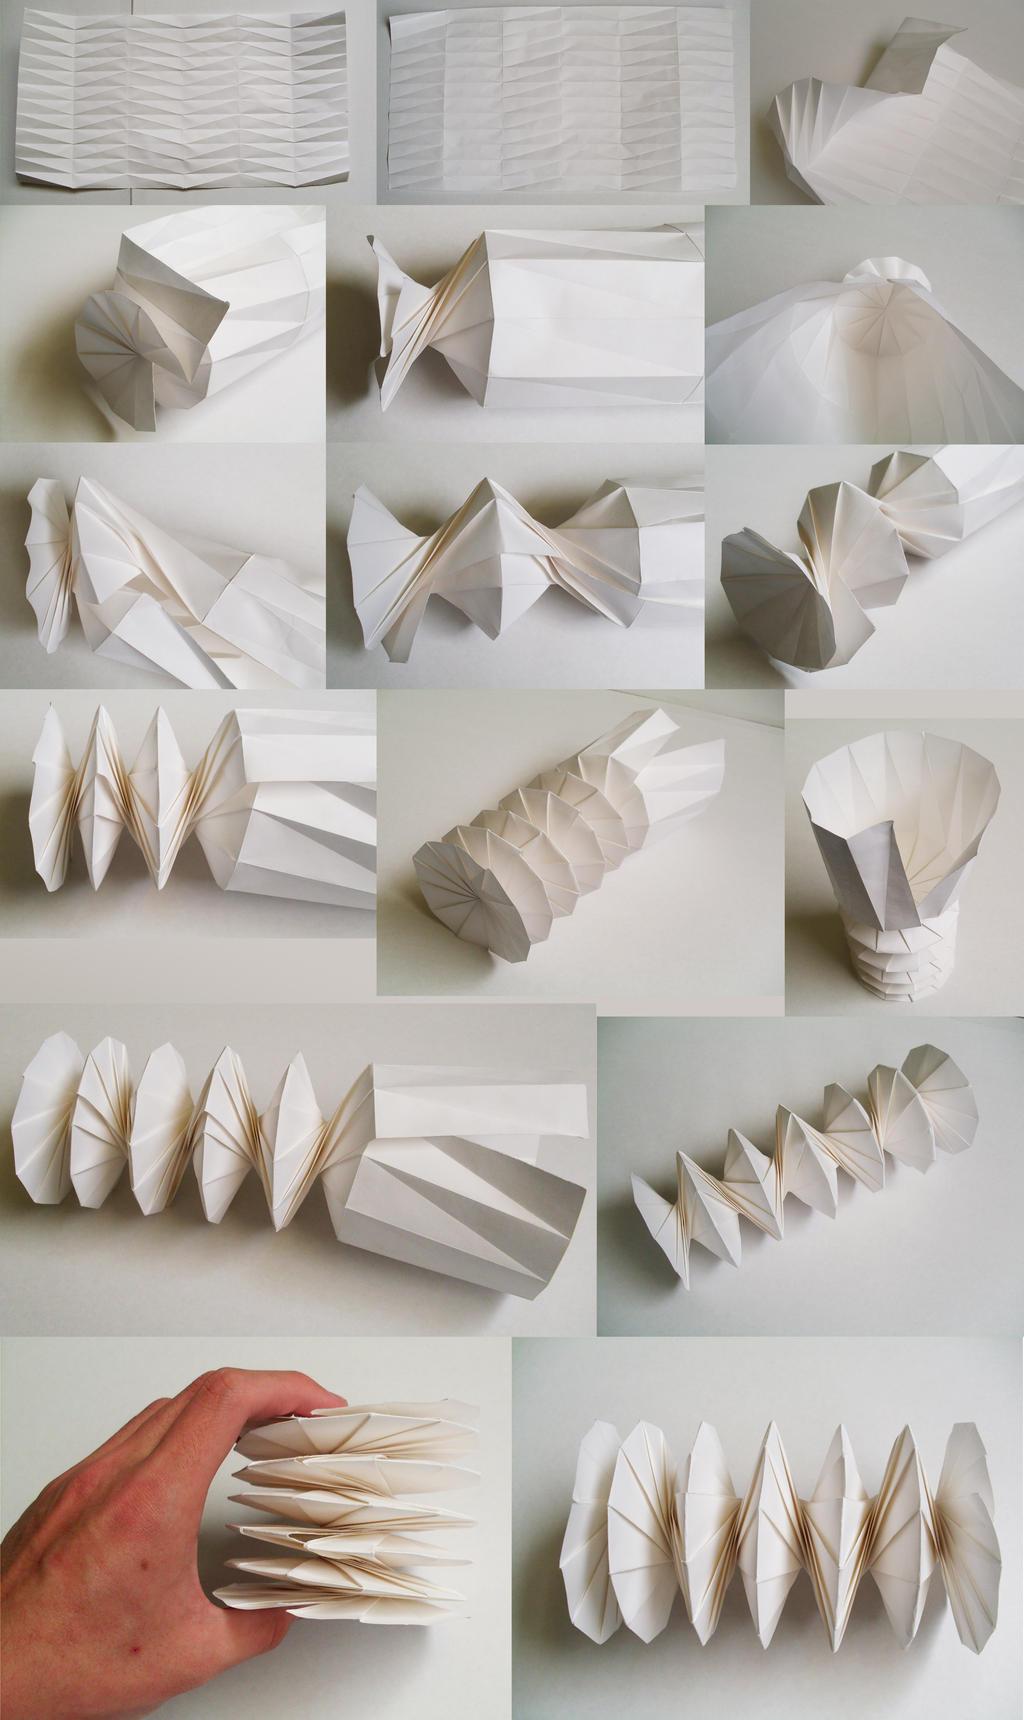 Origami Spring Tutorial Handmade Nut By Jiekai On Deviantart